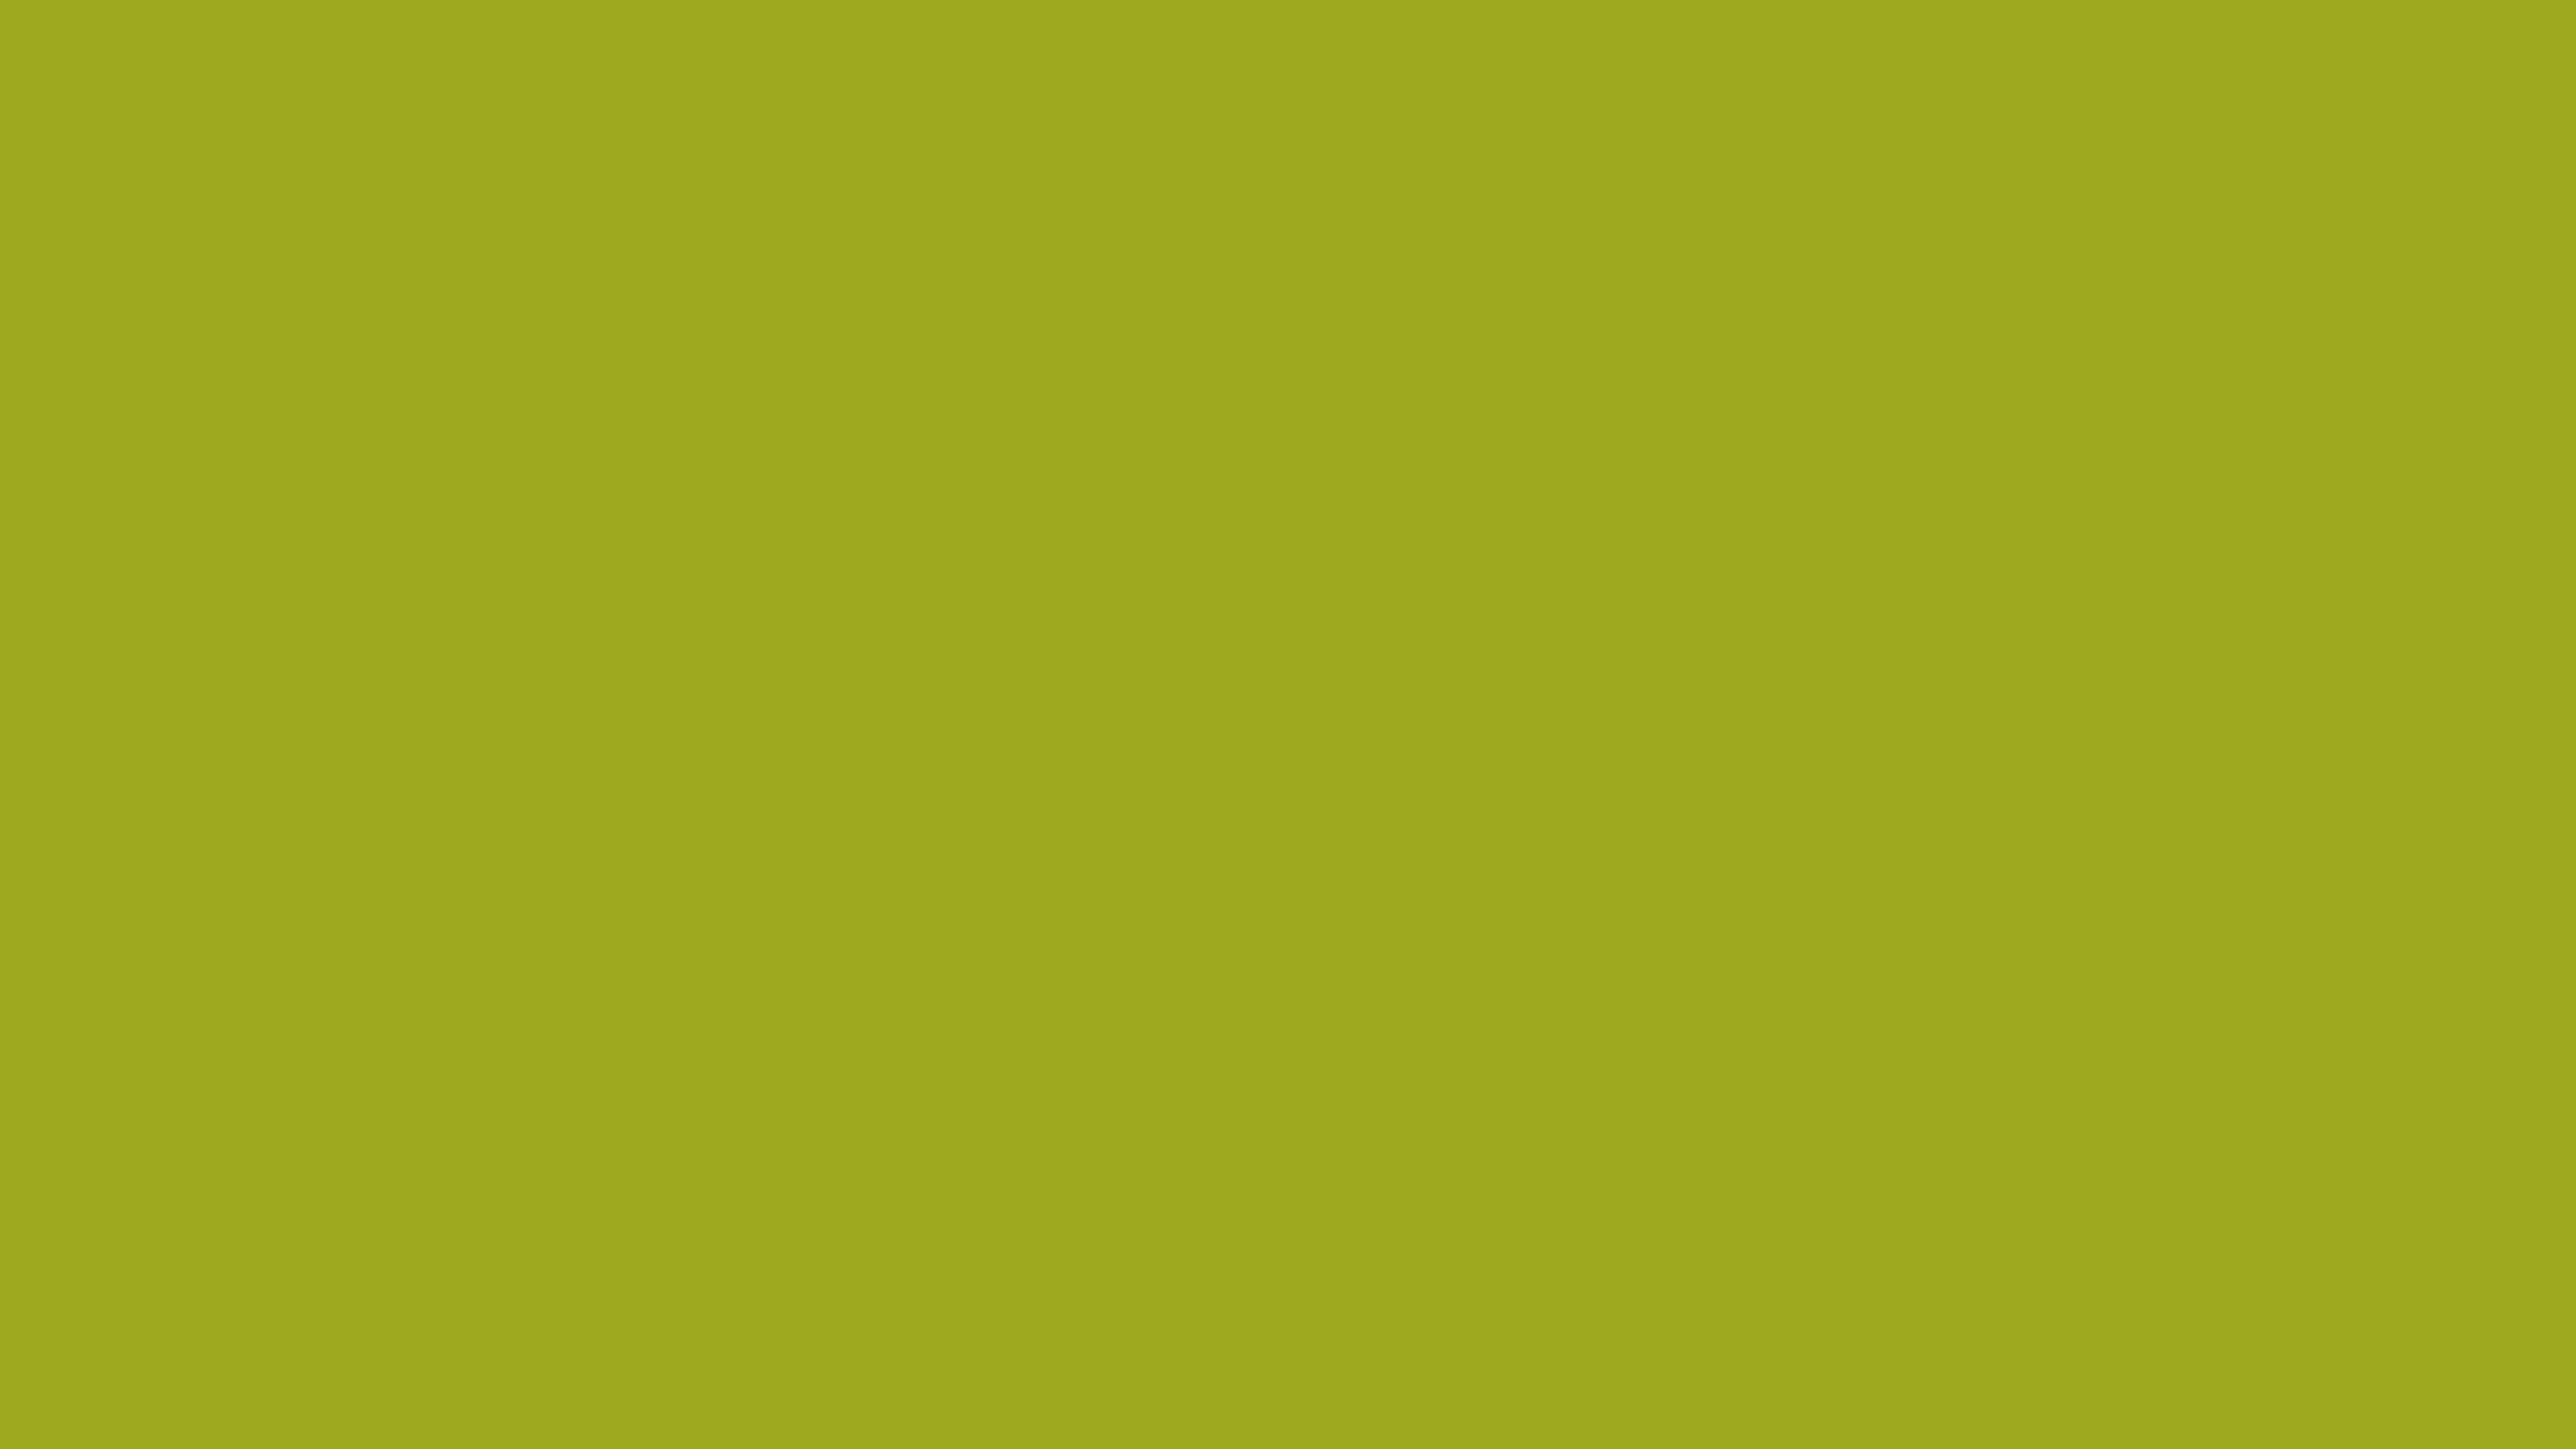 4096x2304 Citron Solid Color Background